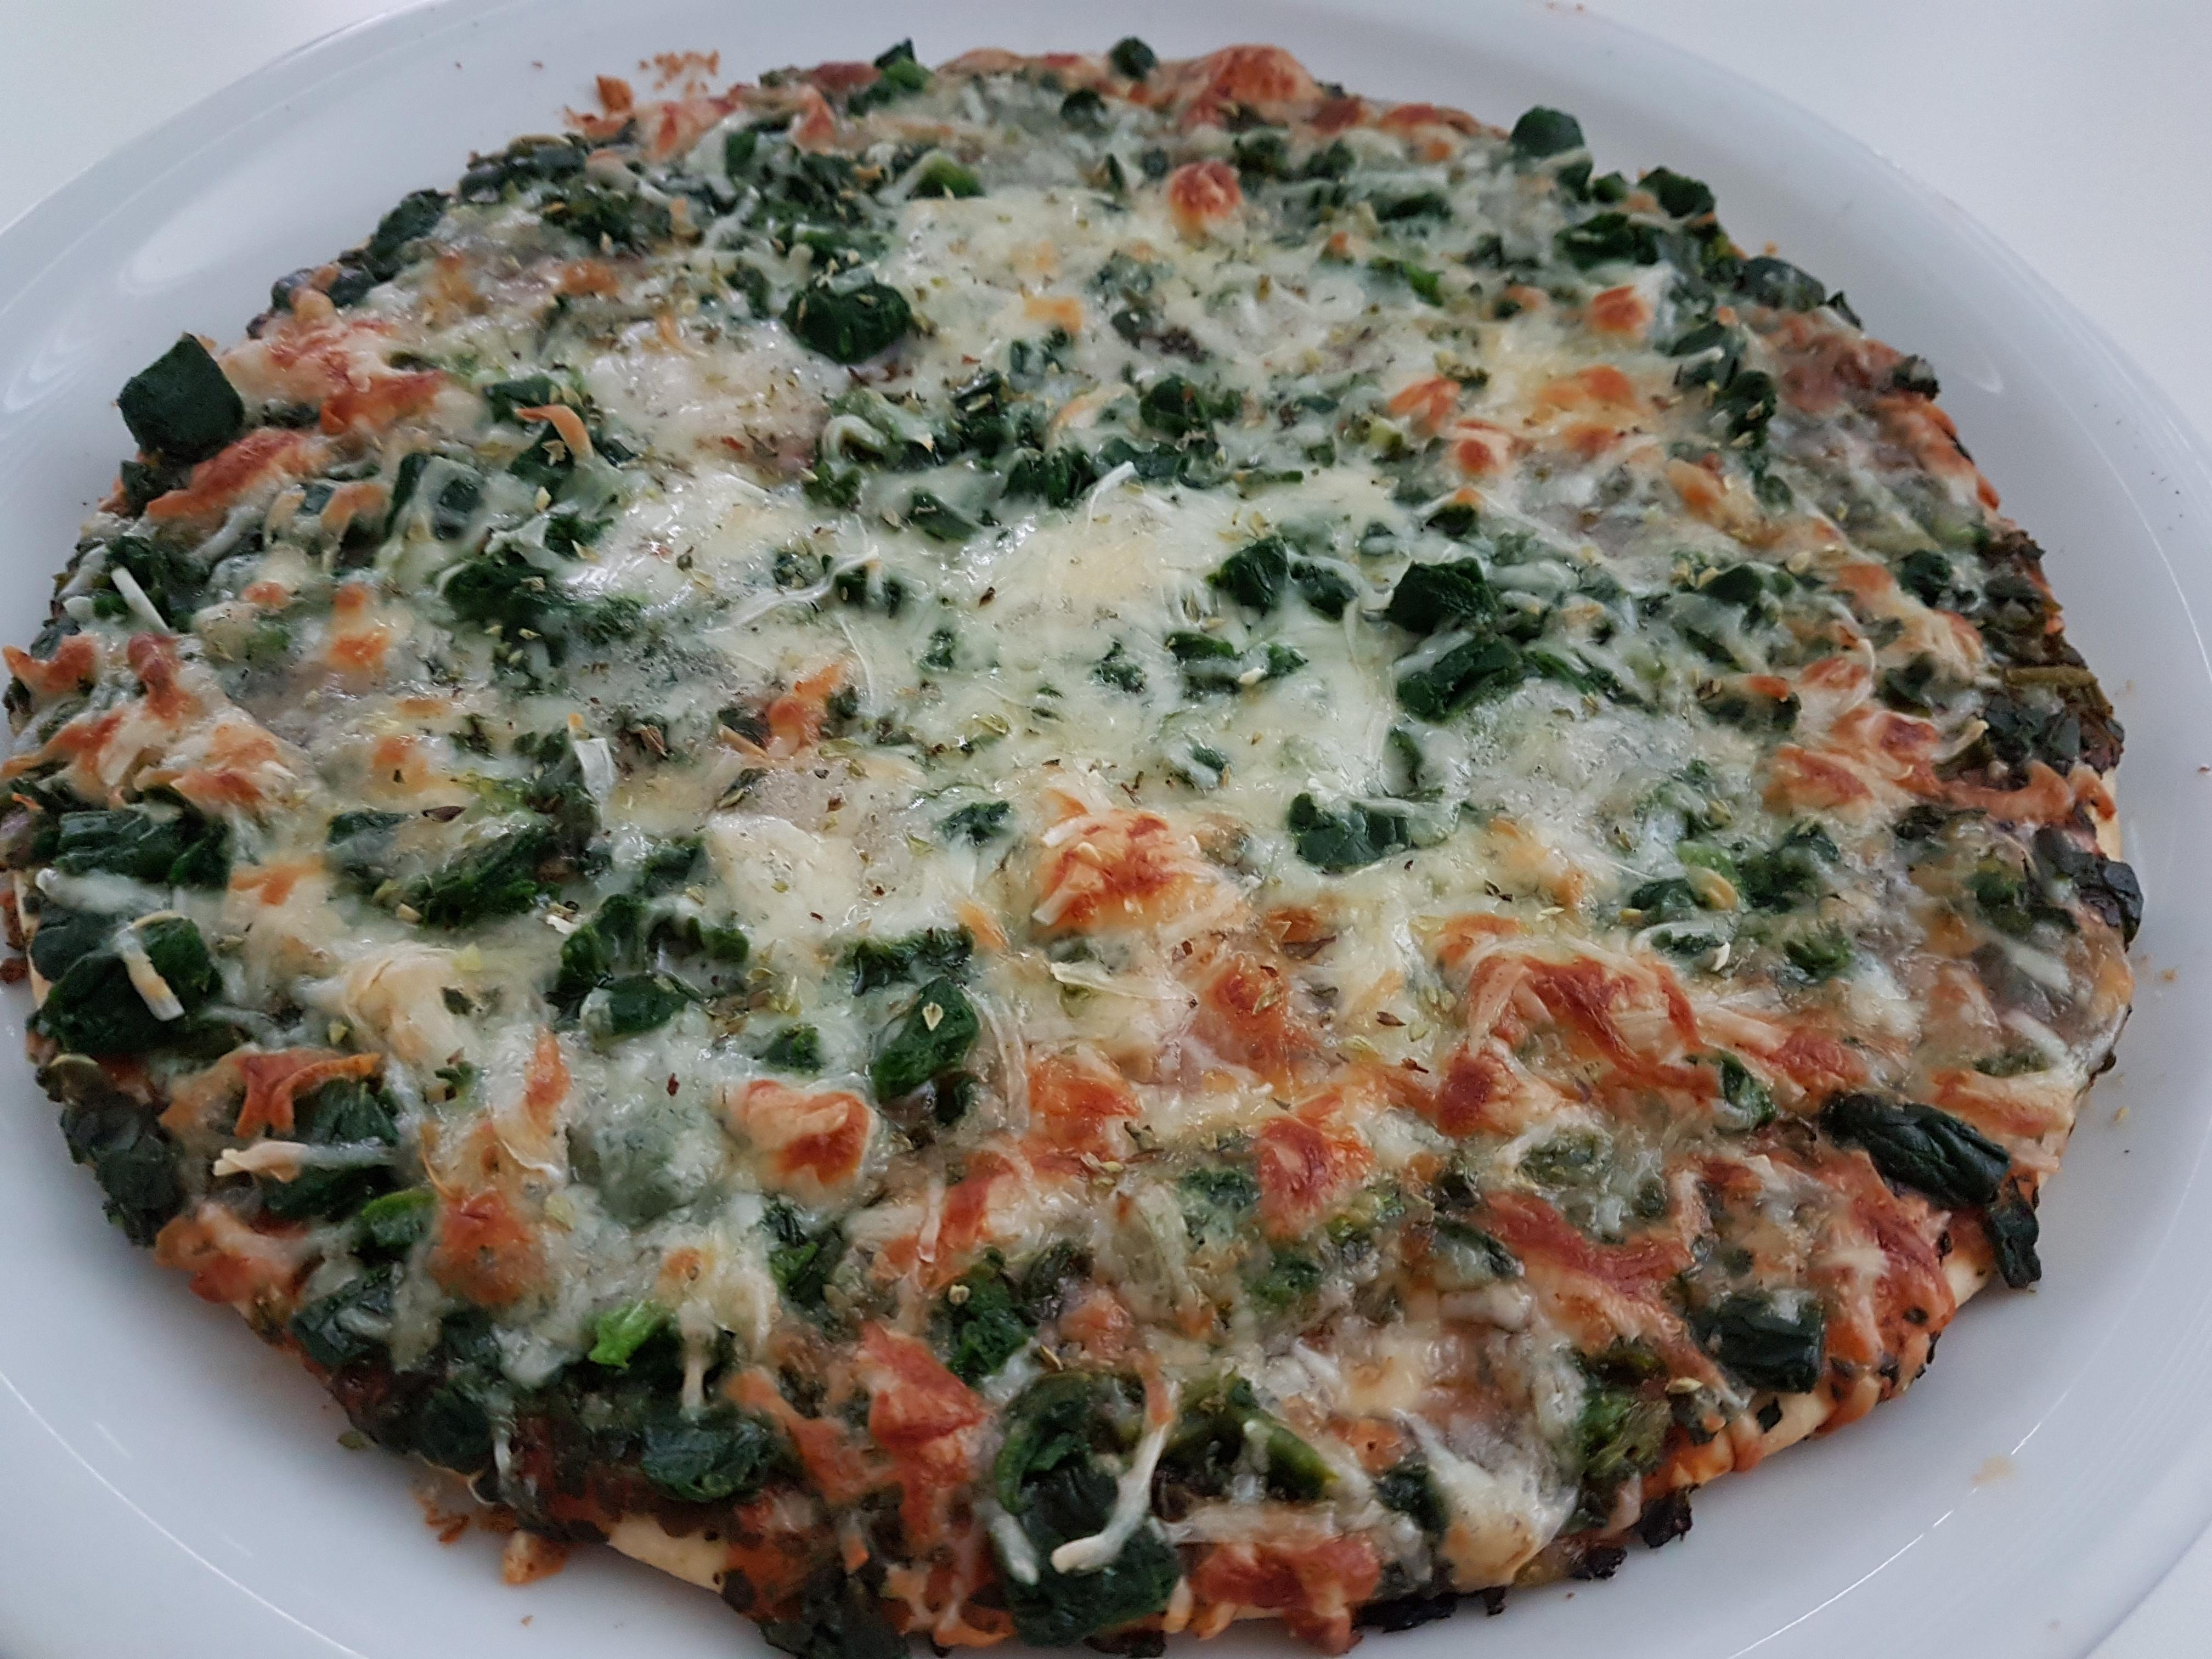 http://foodloader.net/Holz_2017-05-25_Pizza.jpg